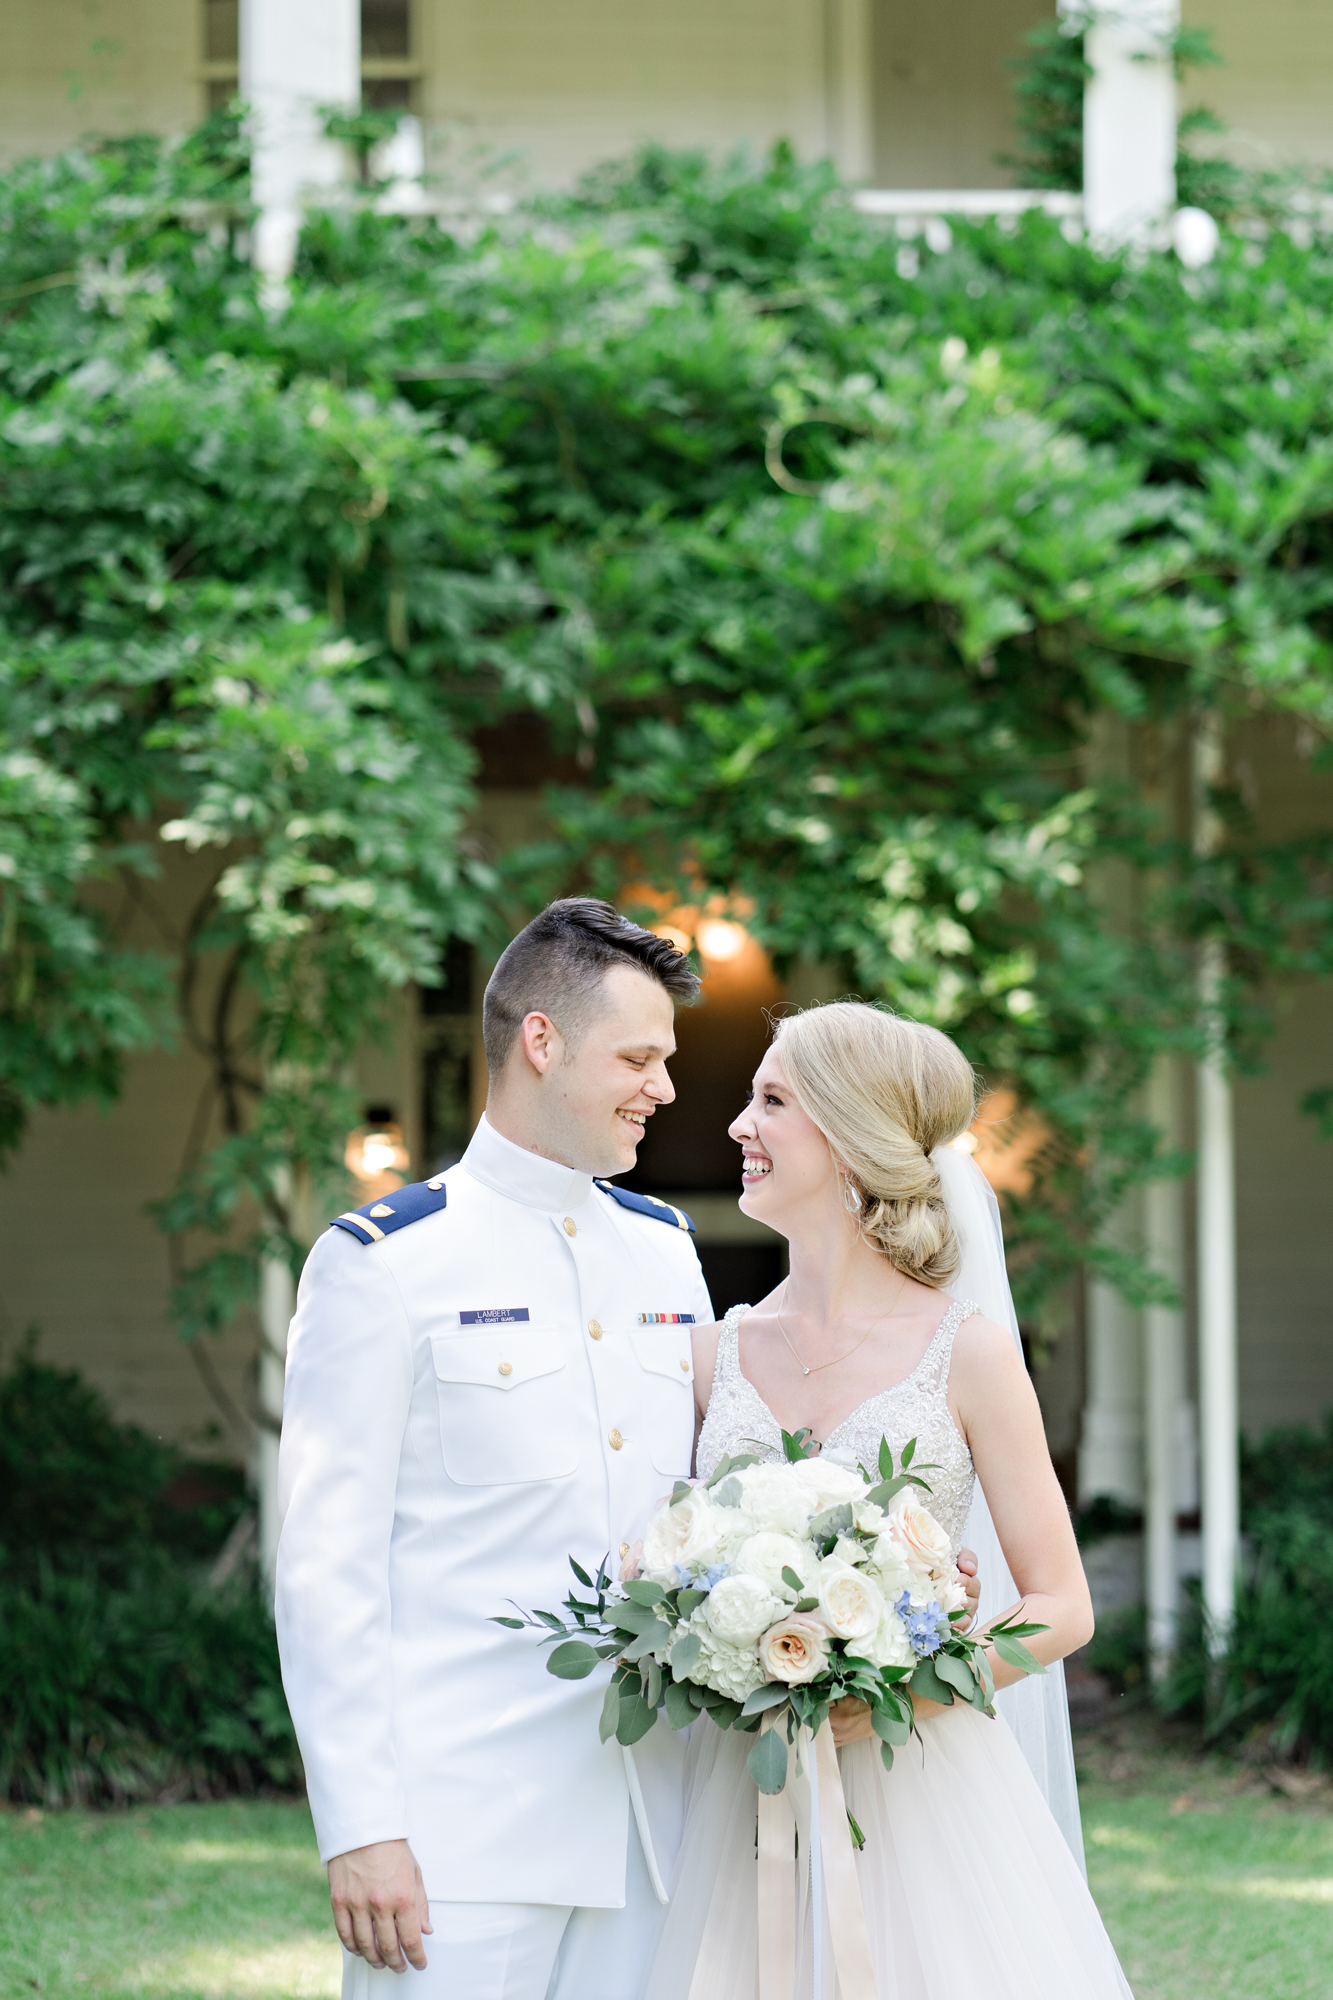 Alabama-Photographers-Nick-Drollette-Wedding-Photography-117.jpg